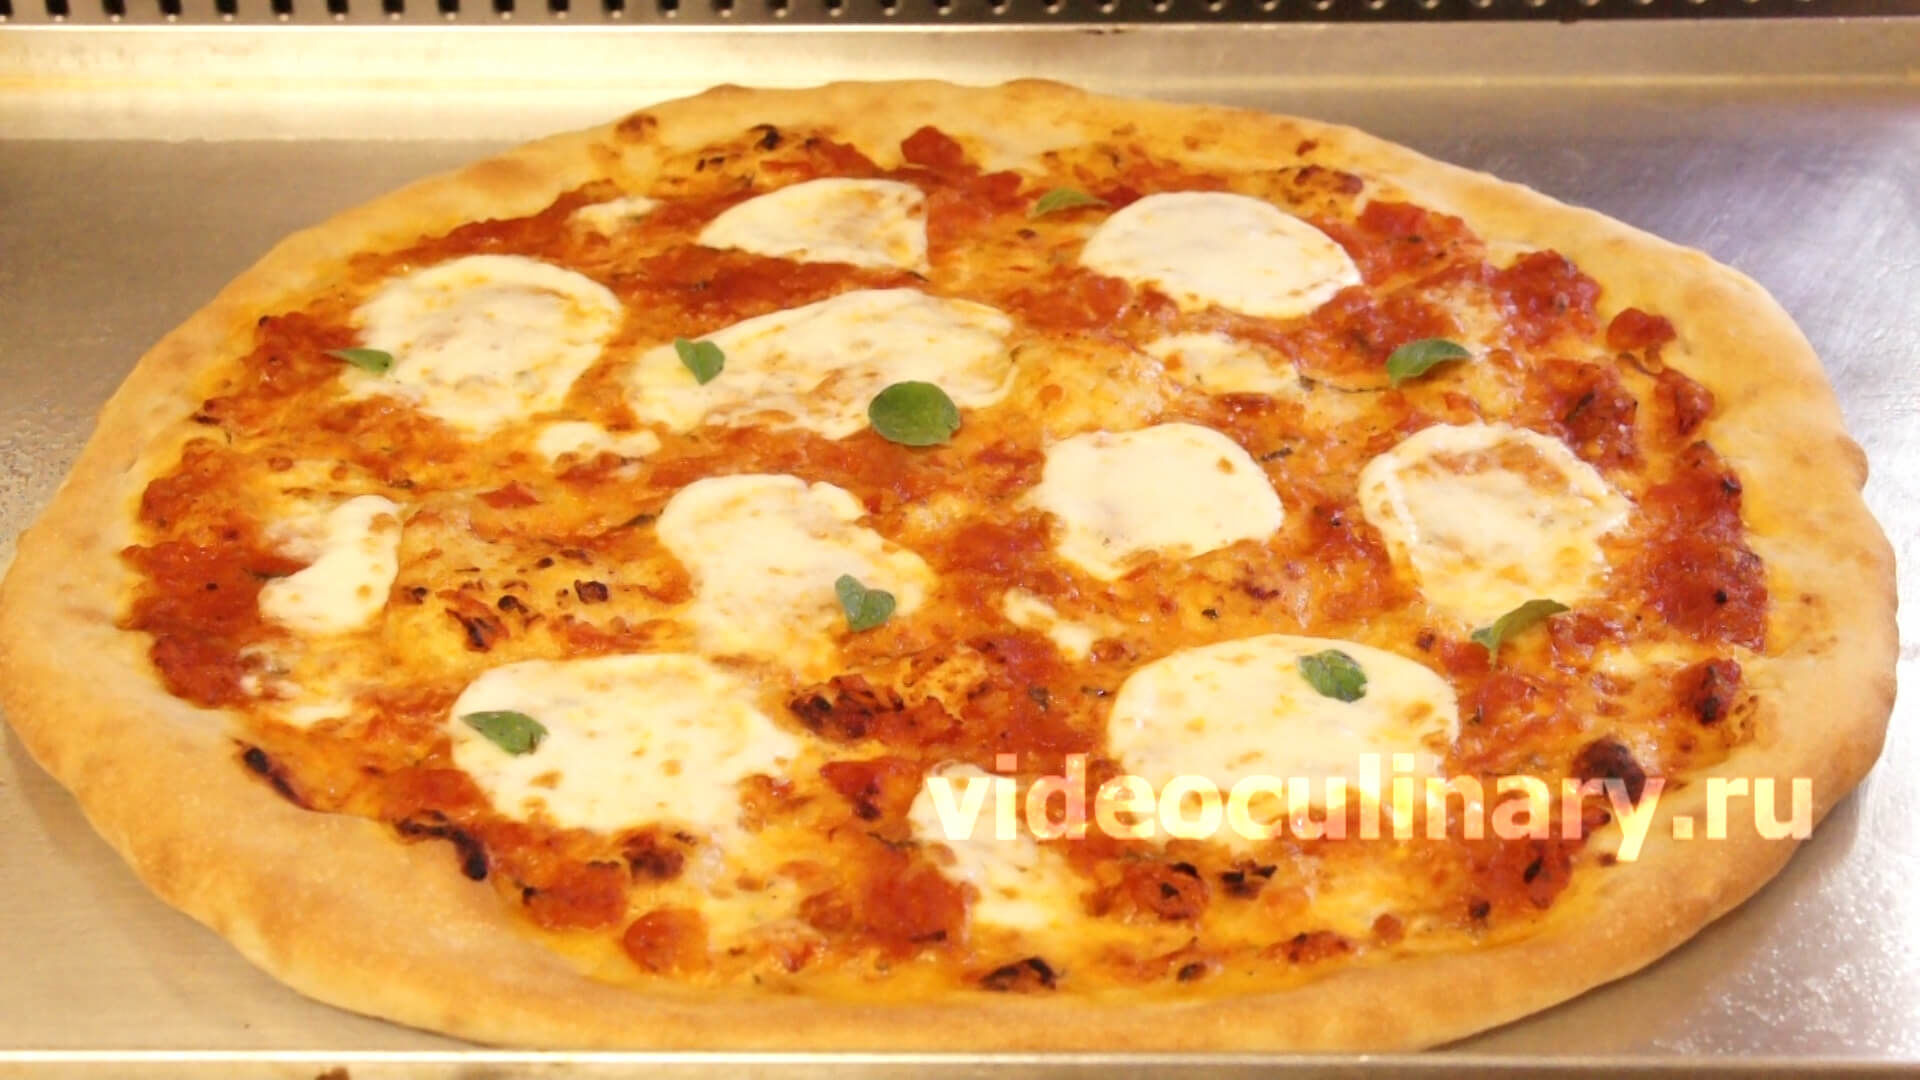 Пицца своими руками дома рецепты